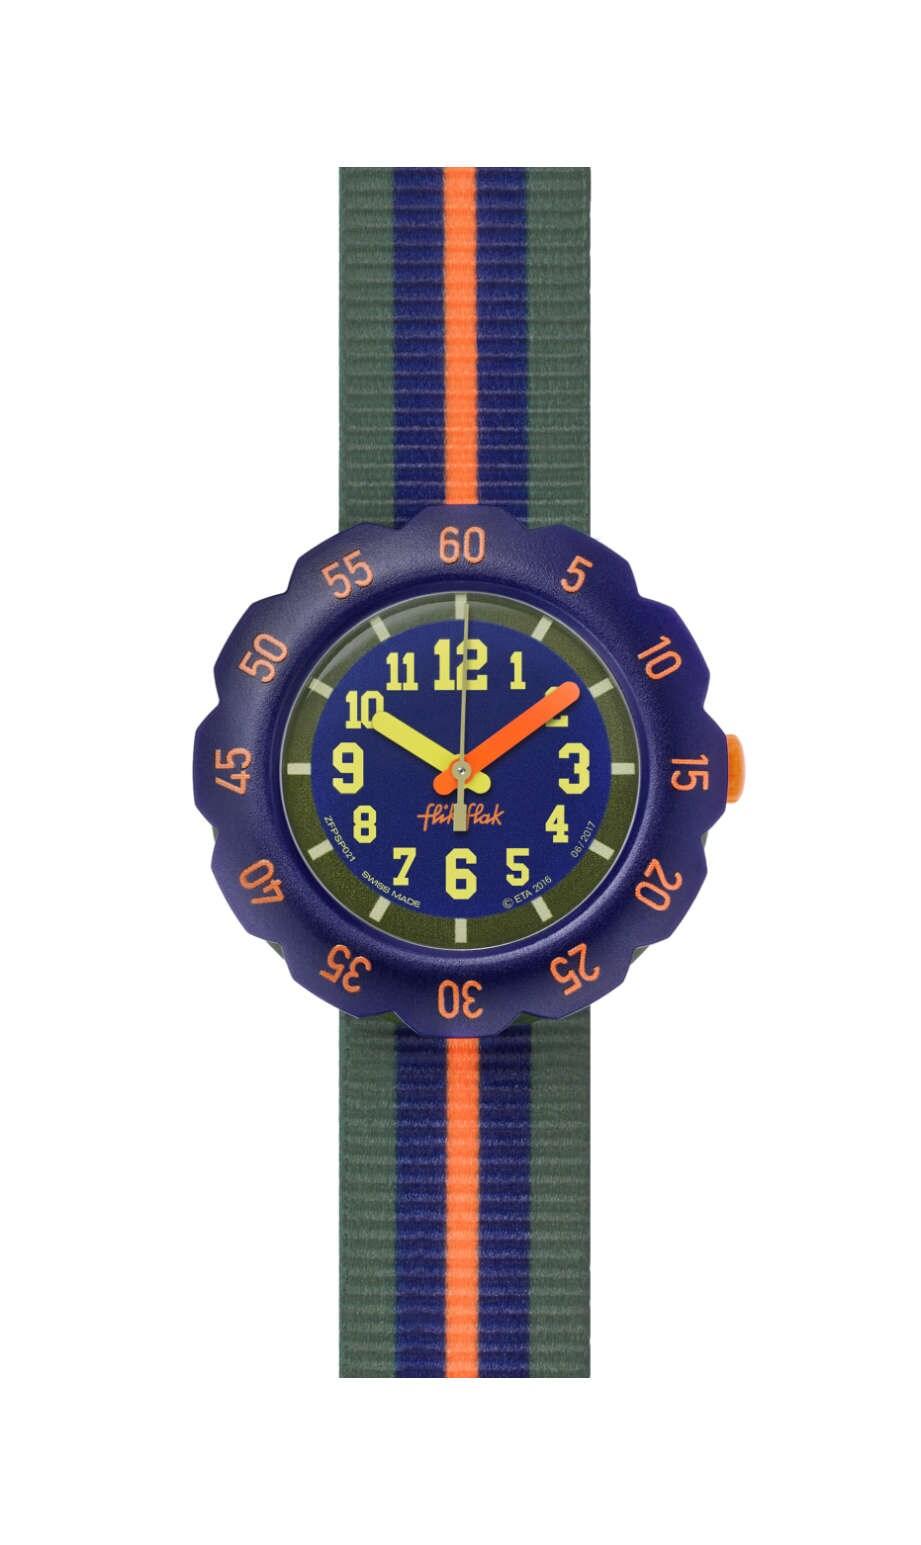 Swatch - ORANGE LINE - 1